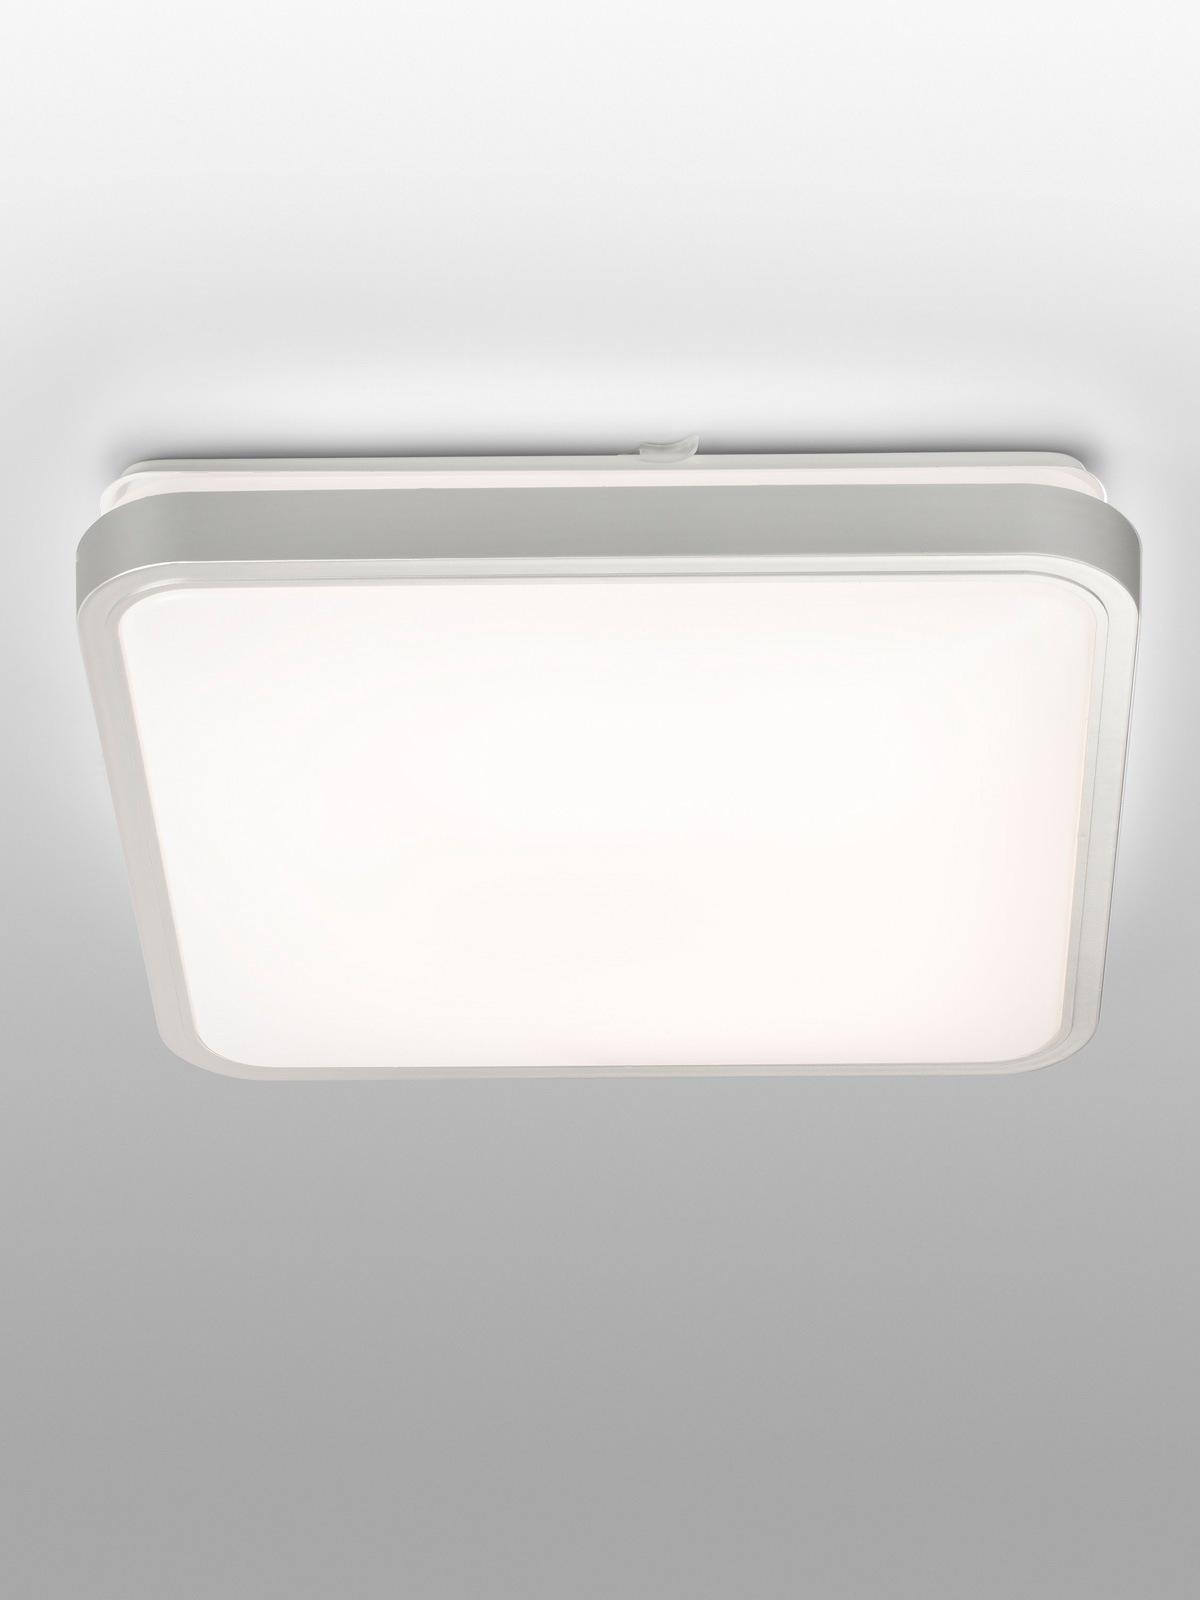 Faro Lampe Iris Deckenlampe DesignOrt Onlineshop